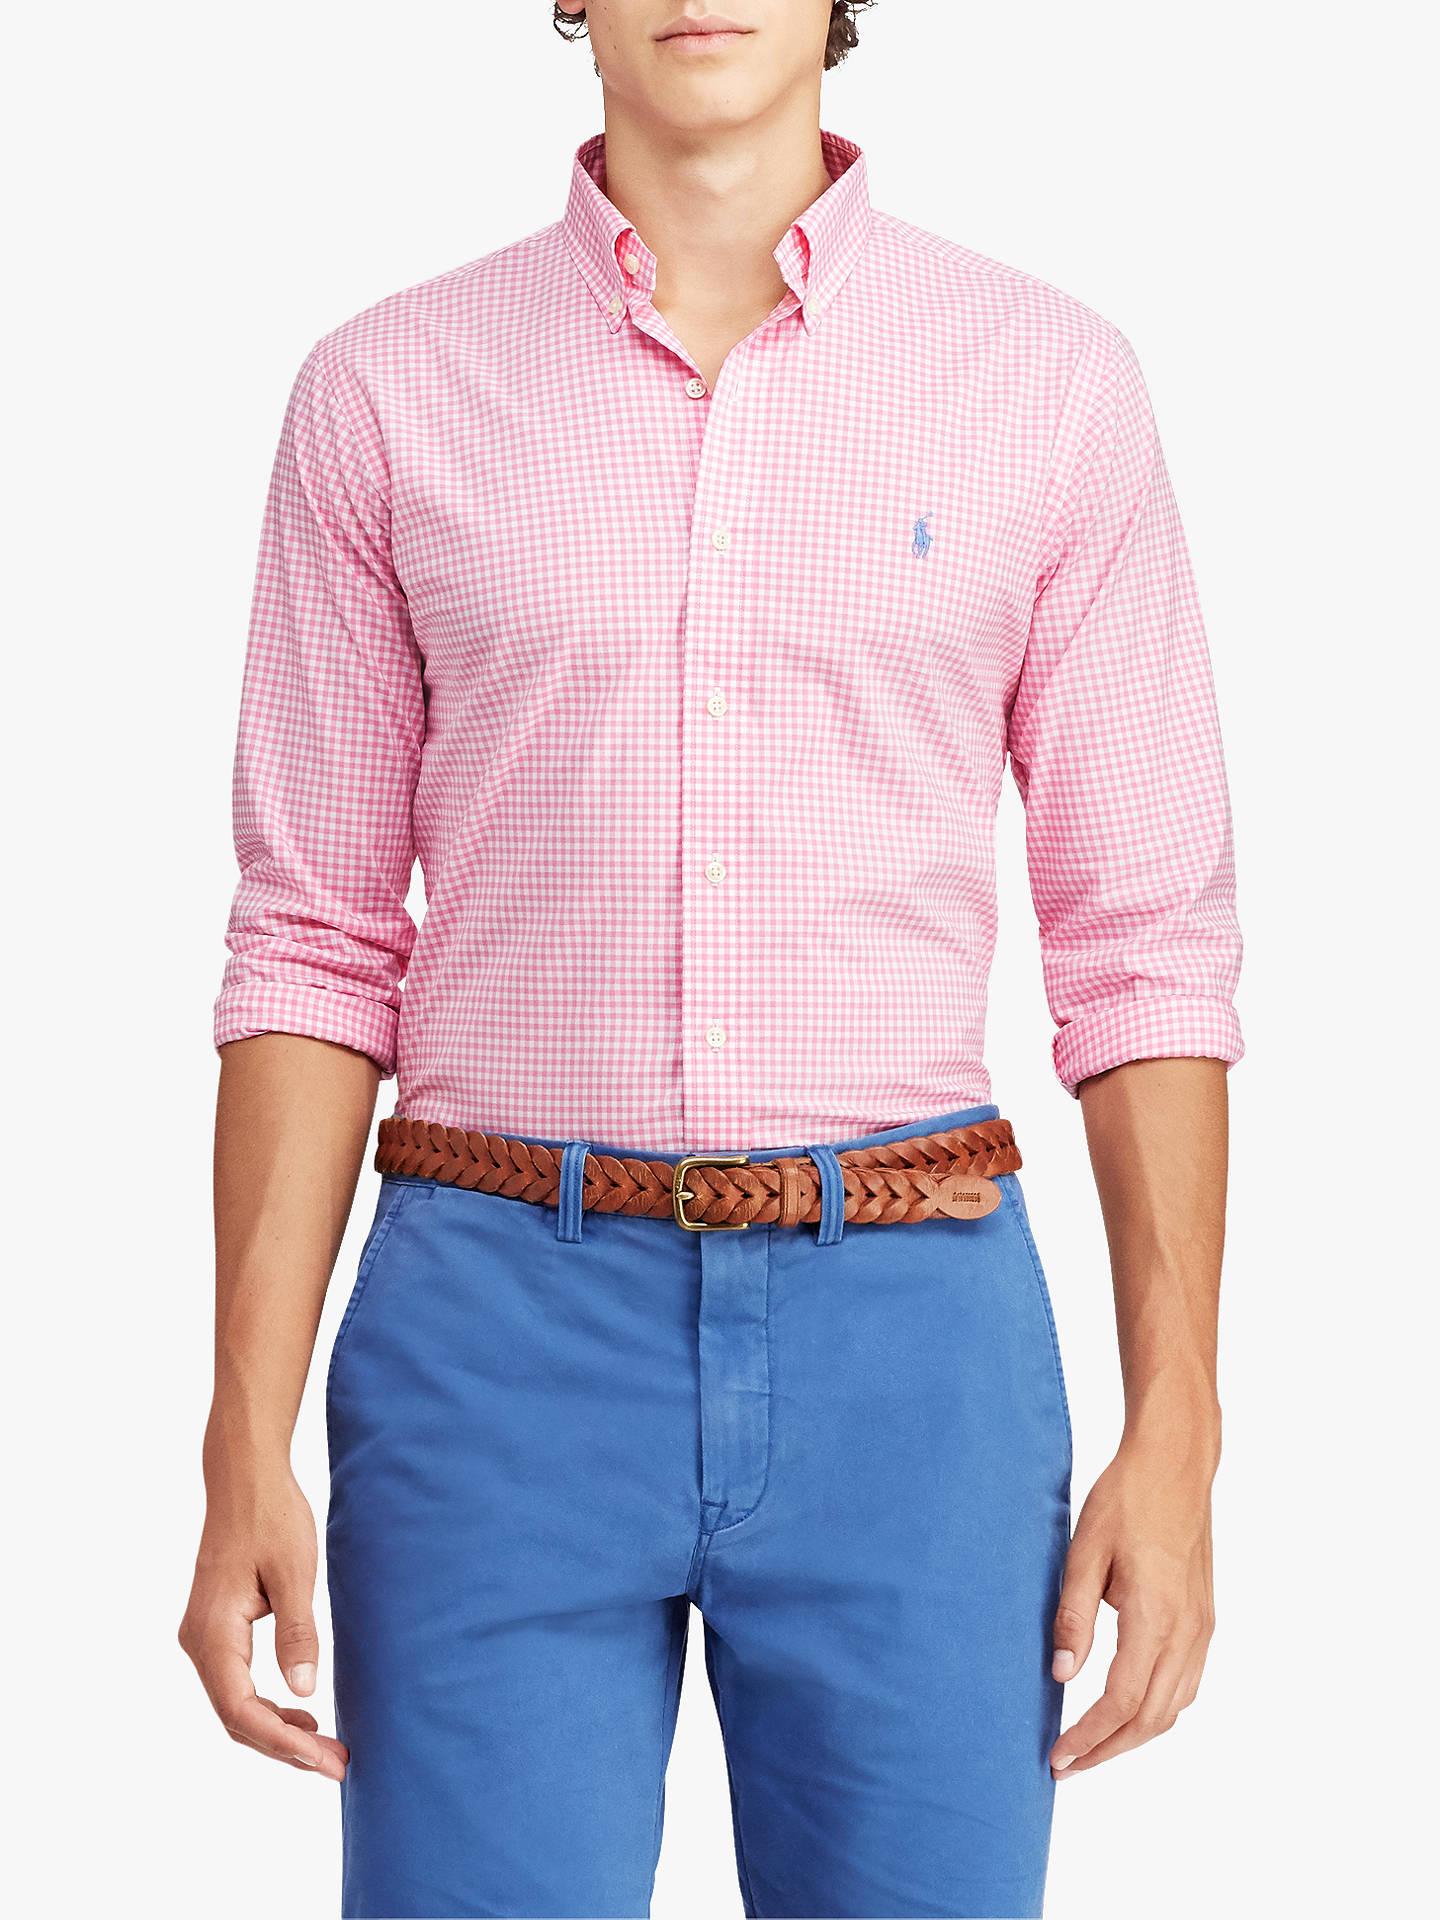 881bf7144ff1e5 Buy Polo Ralph Lauren Classic Fit Gingham Shirt